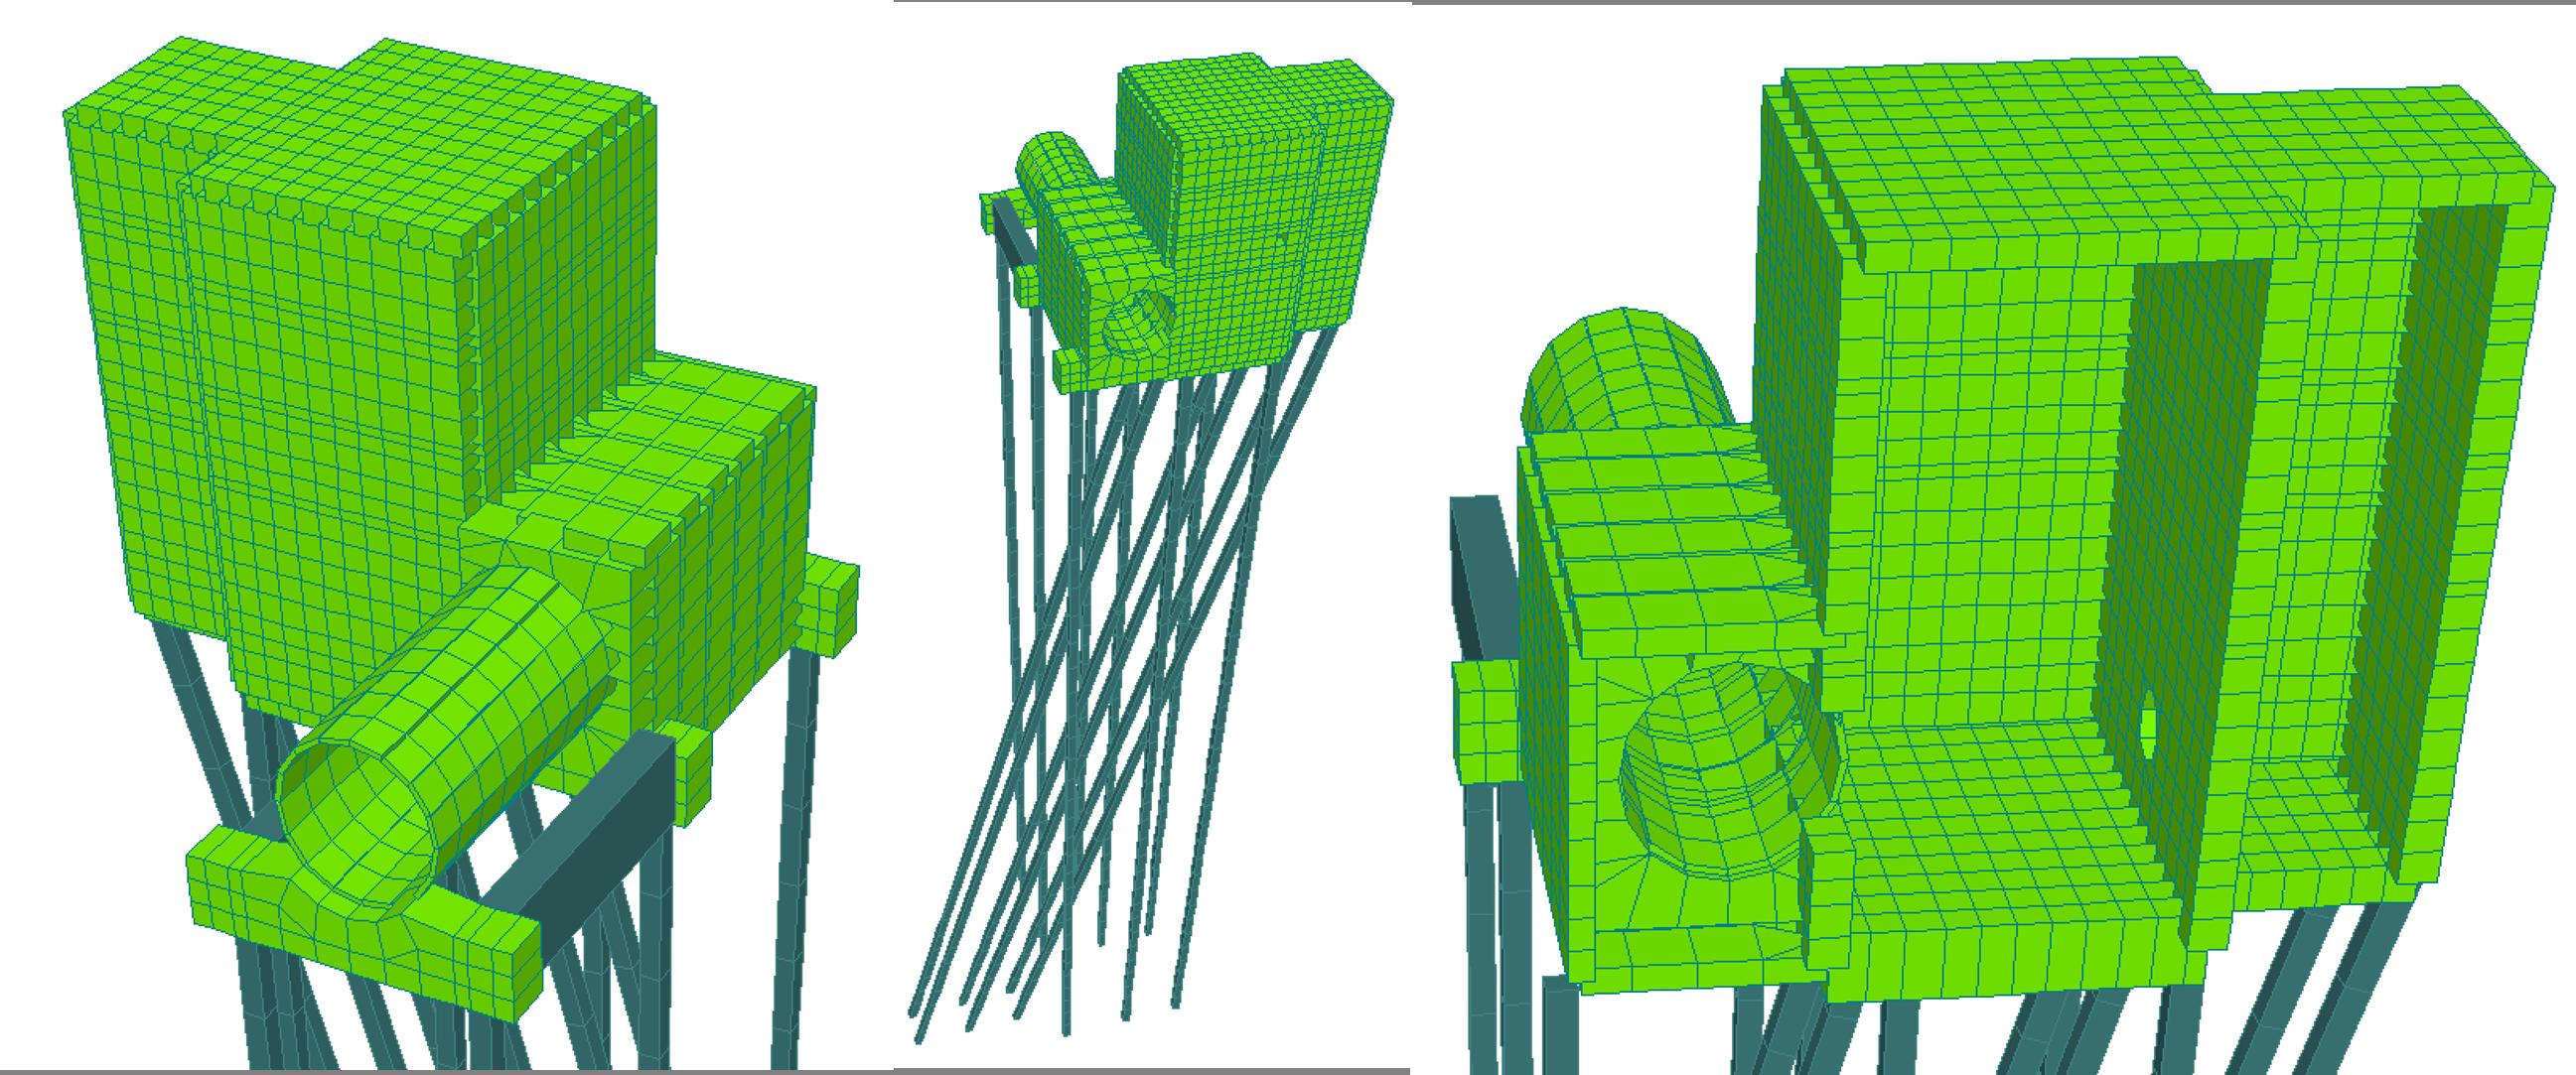 5. Tuberia Tibitoc-Usaquen,  tramo inestable estructura sobre pilotes inclinados, caja purga 20 pulgadas